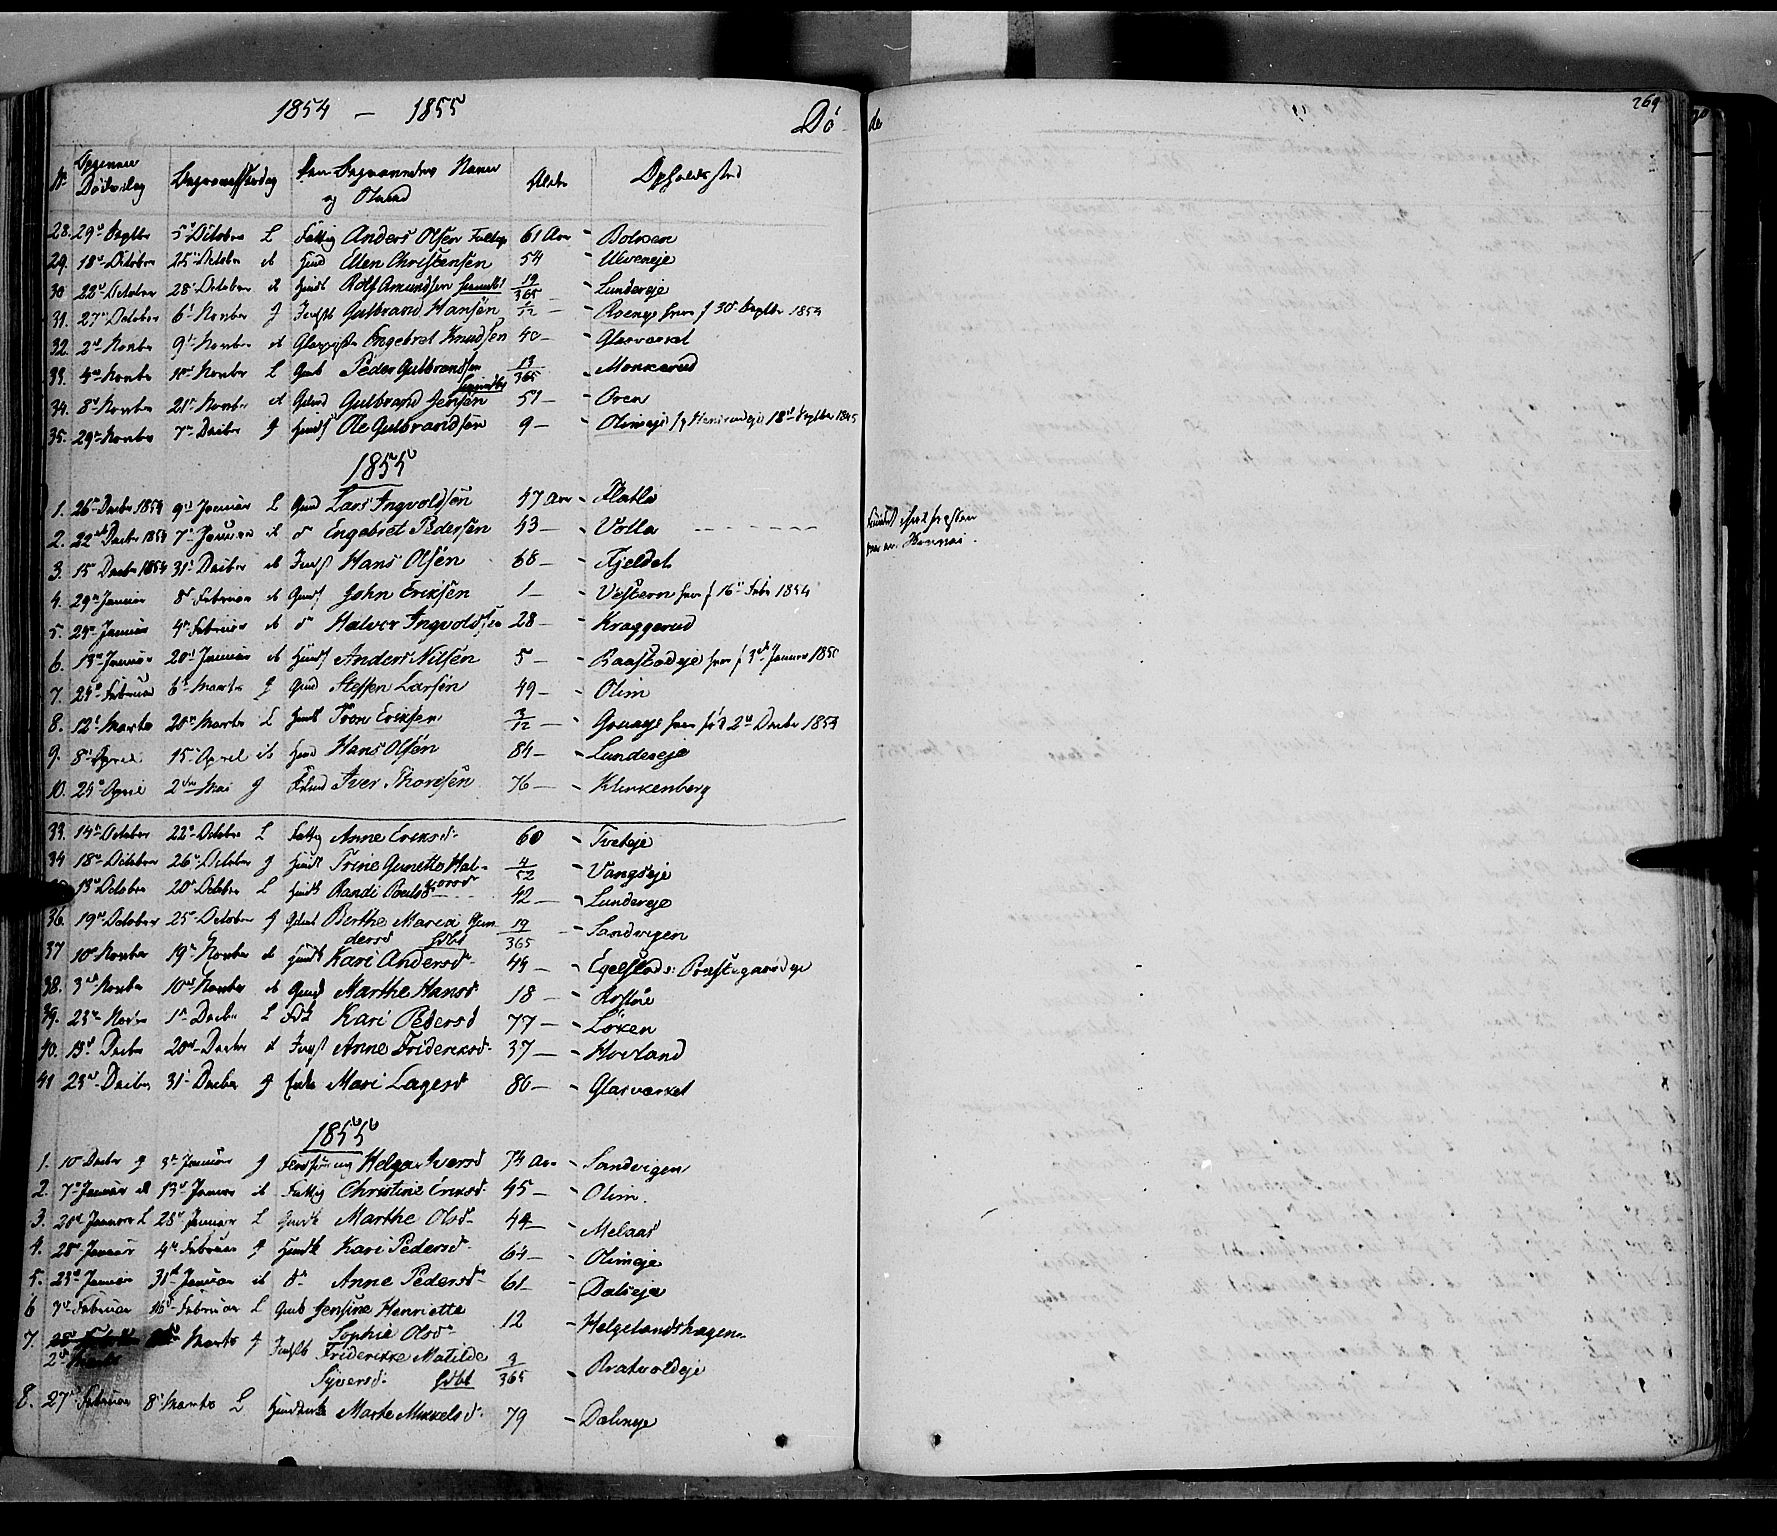 SAH, Jevnaker prestekontor, Ministerialbok nr. 6, 1837-1857, s. 269